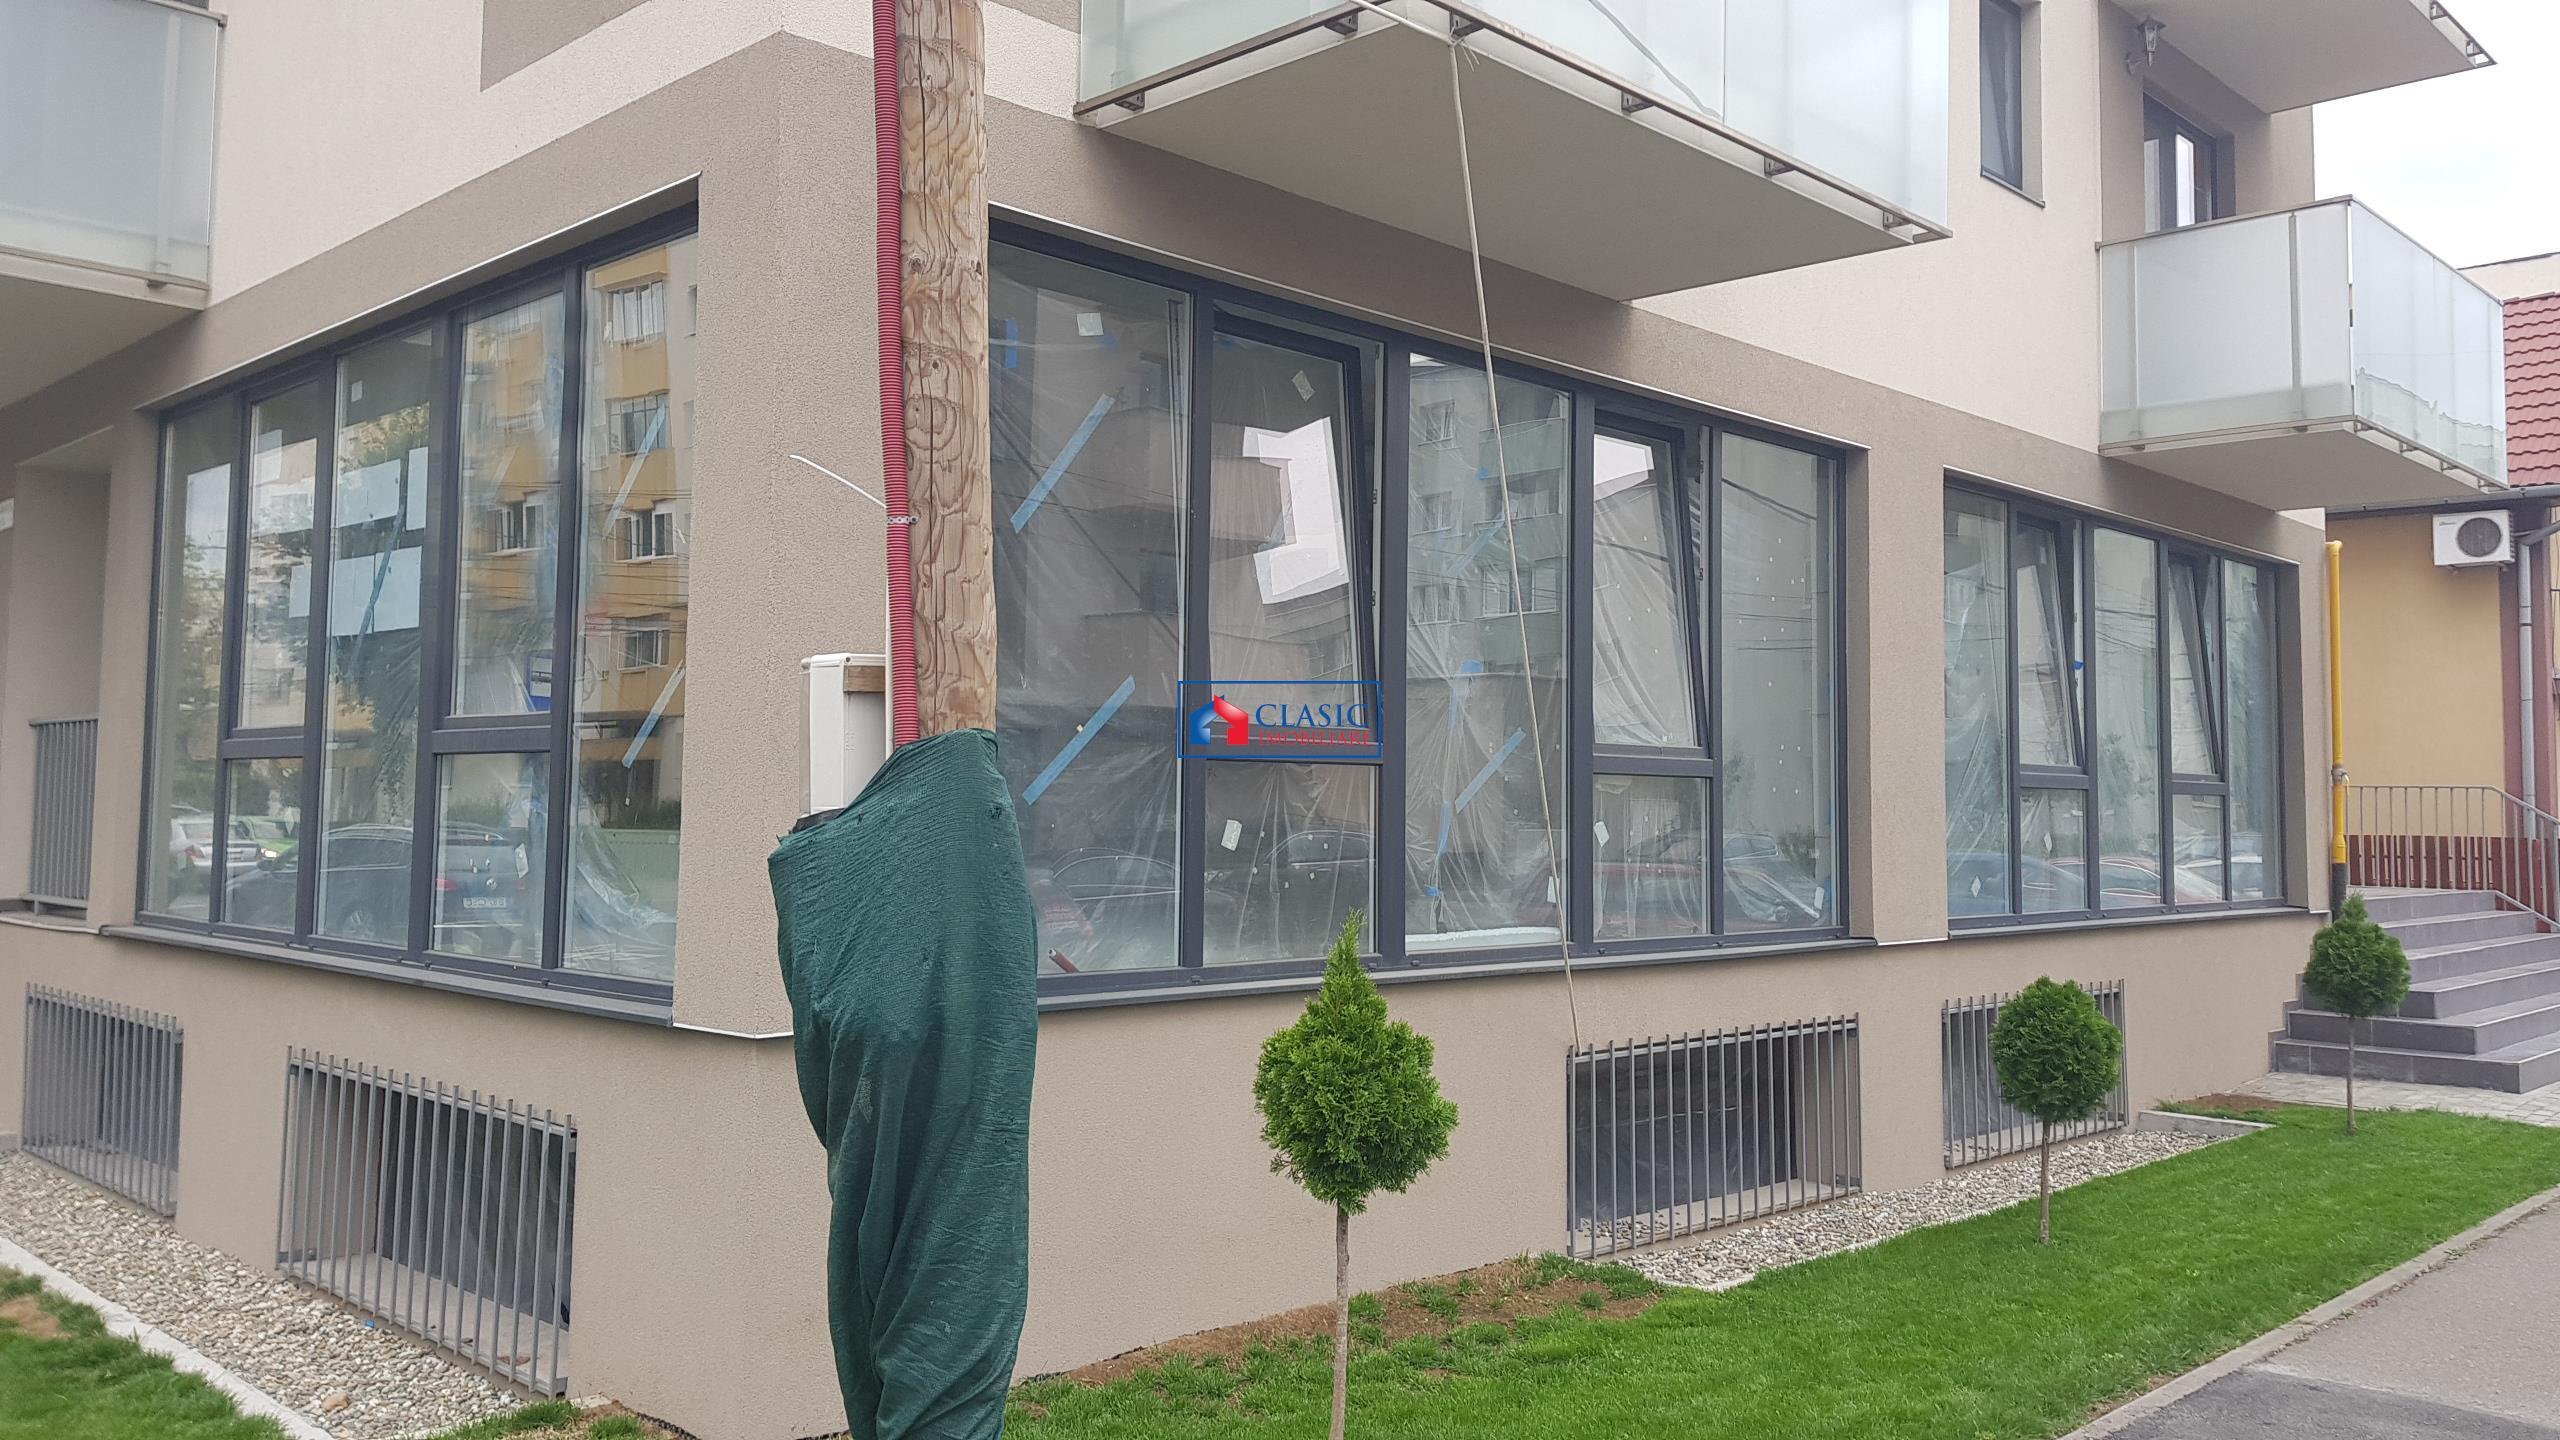 Spatiu comercial 100 mp de vanzare situat in zona Marasti, Cluj Napoca